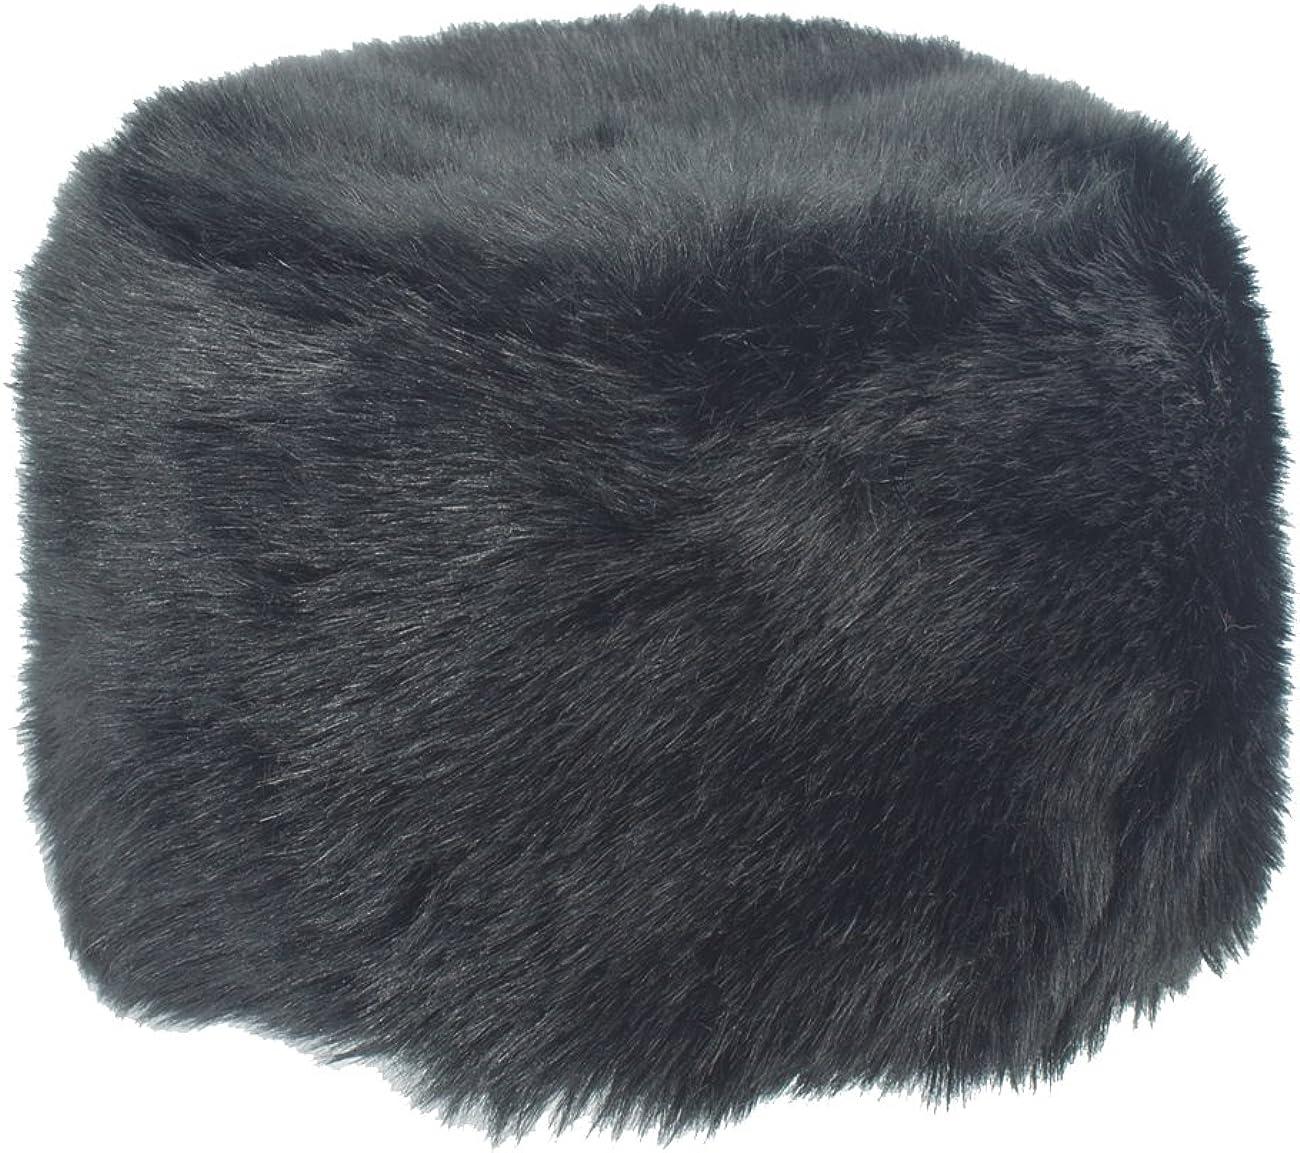 Dahlia Women's Skullies & Beanies - Wool Slouch Beanie, Rhinestone/Bow, Black